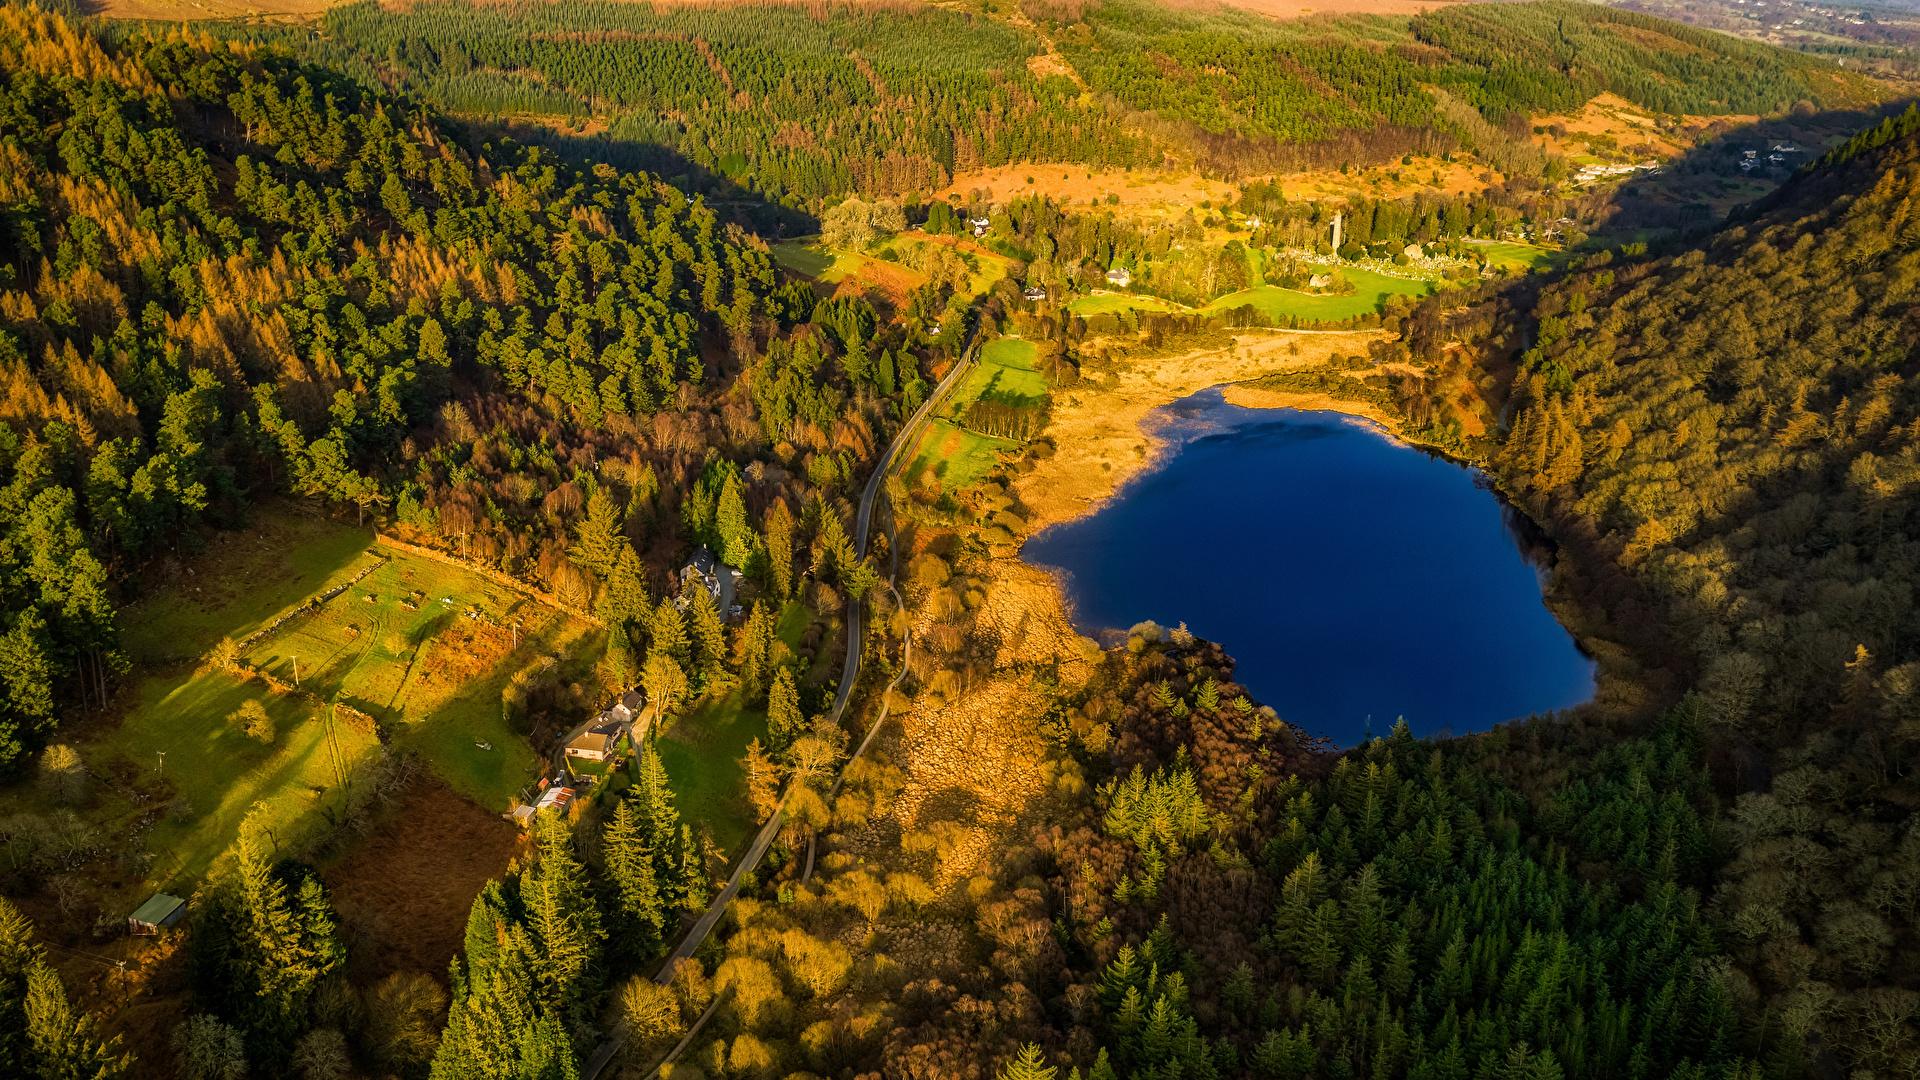 Photos Ireland Glendalough Wicklow Mountains National Park 1920x1080 1920x1080